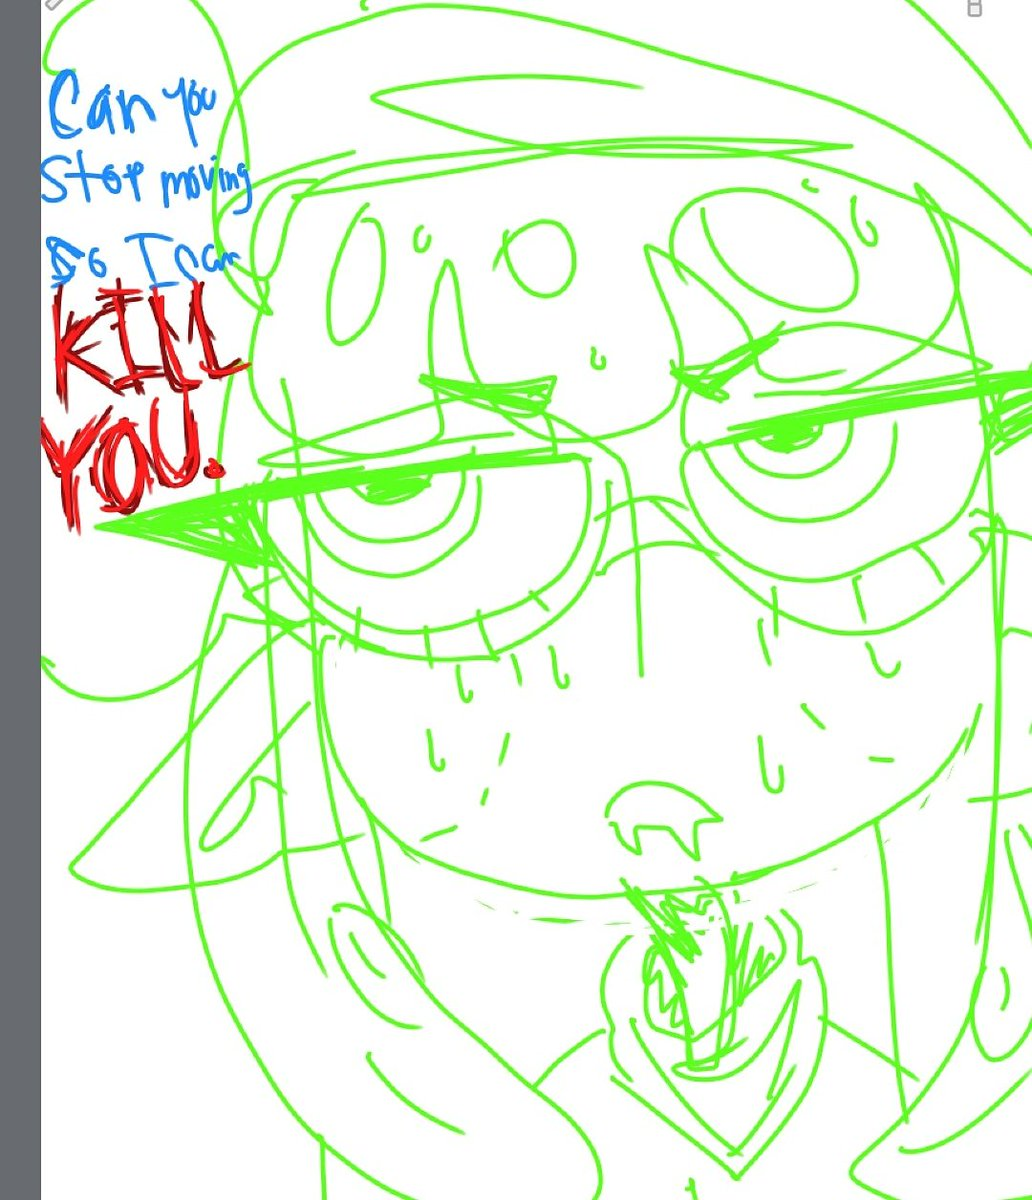 I suck atatata digital art so I Doodle on my phone: ^) because I'm a roke ish #digitalart #squidsona #splatoon2 #oc #squidoc #medibangpic.twitter.com/isvZ0Y08ab